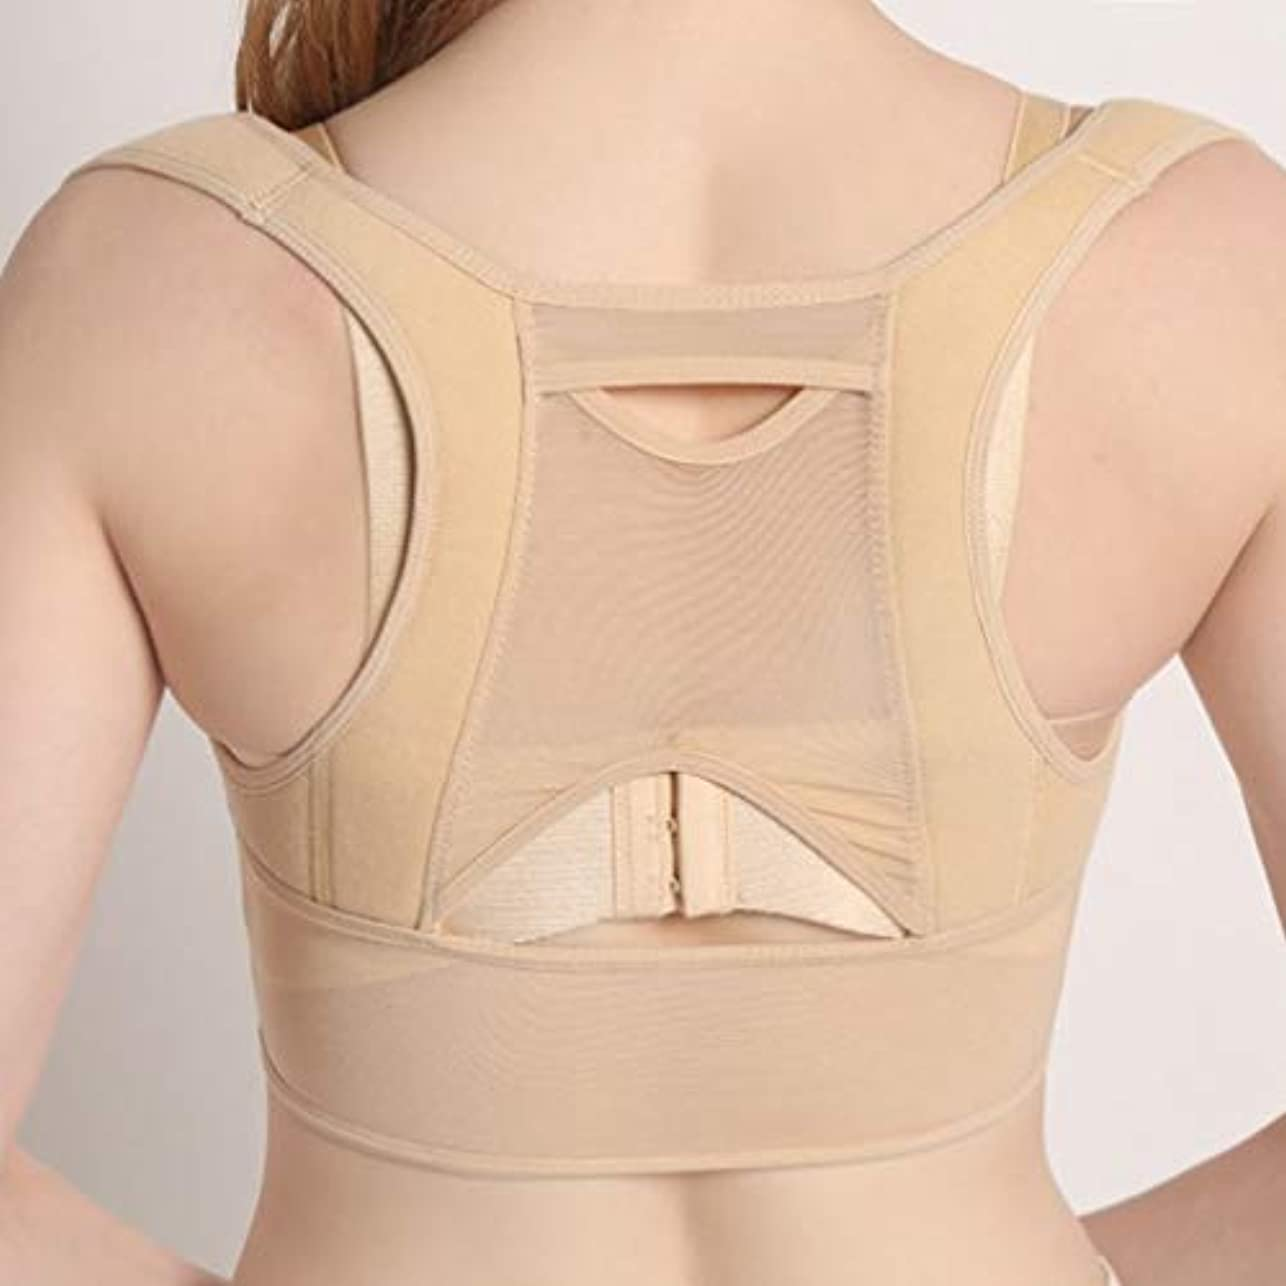 西期間望む背部姿勢補正コルセット上背部肩背骨姿勢補正器背部姿勢、補正コルセット、整形外科、上背部、肩背骨、姿勢補正器ベージュホワイトM